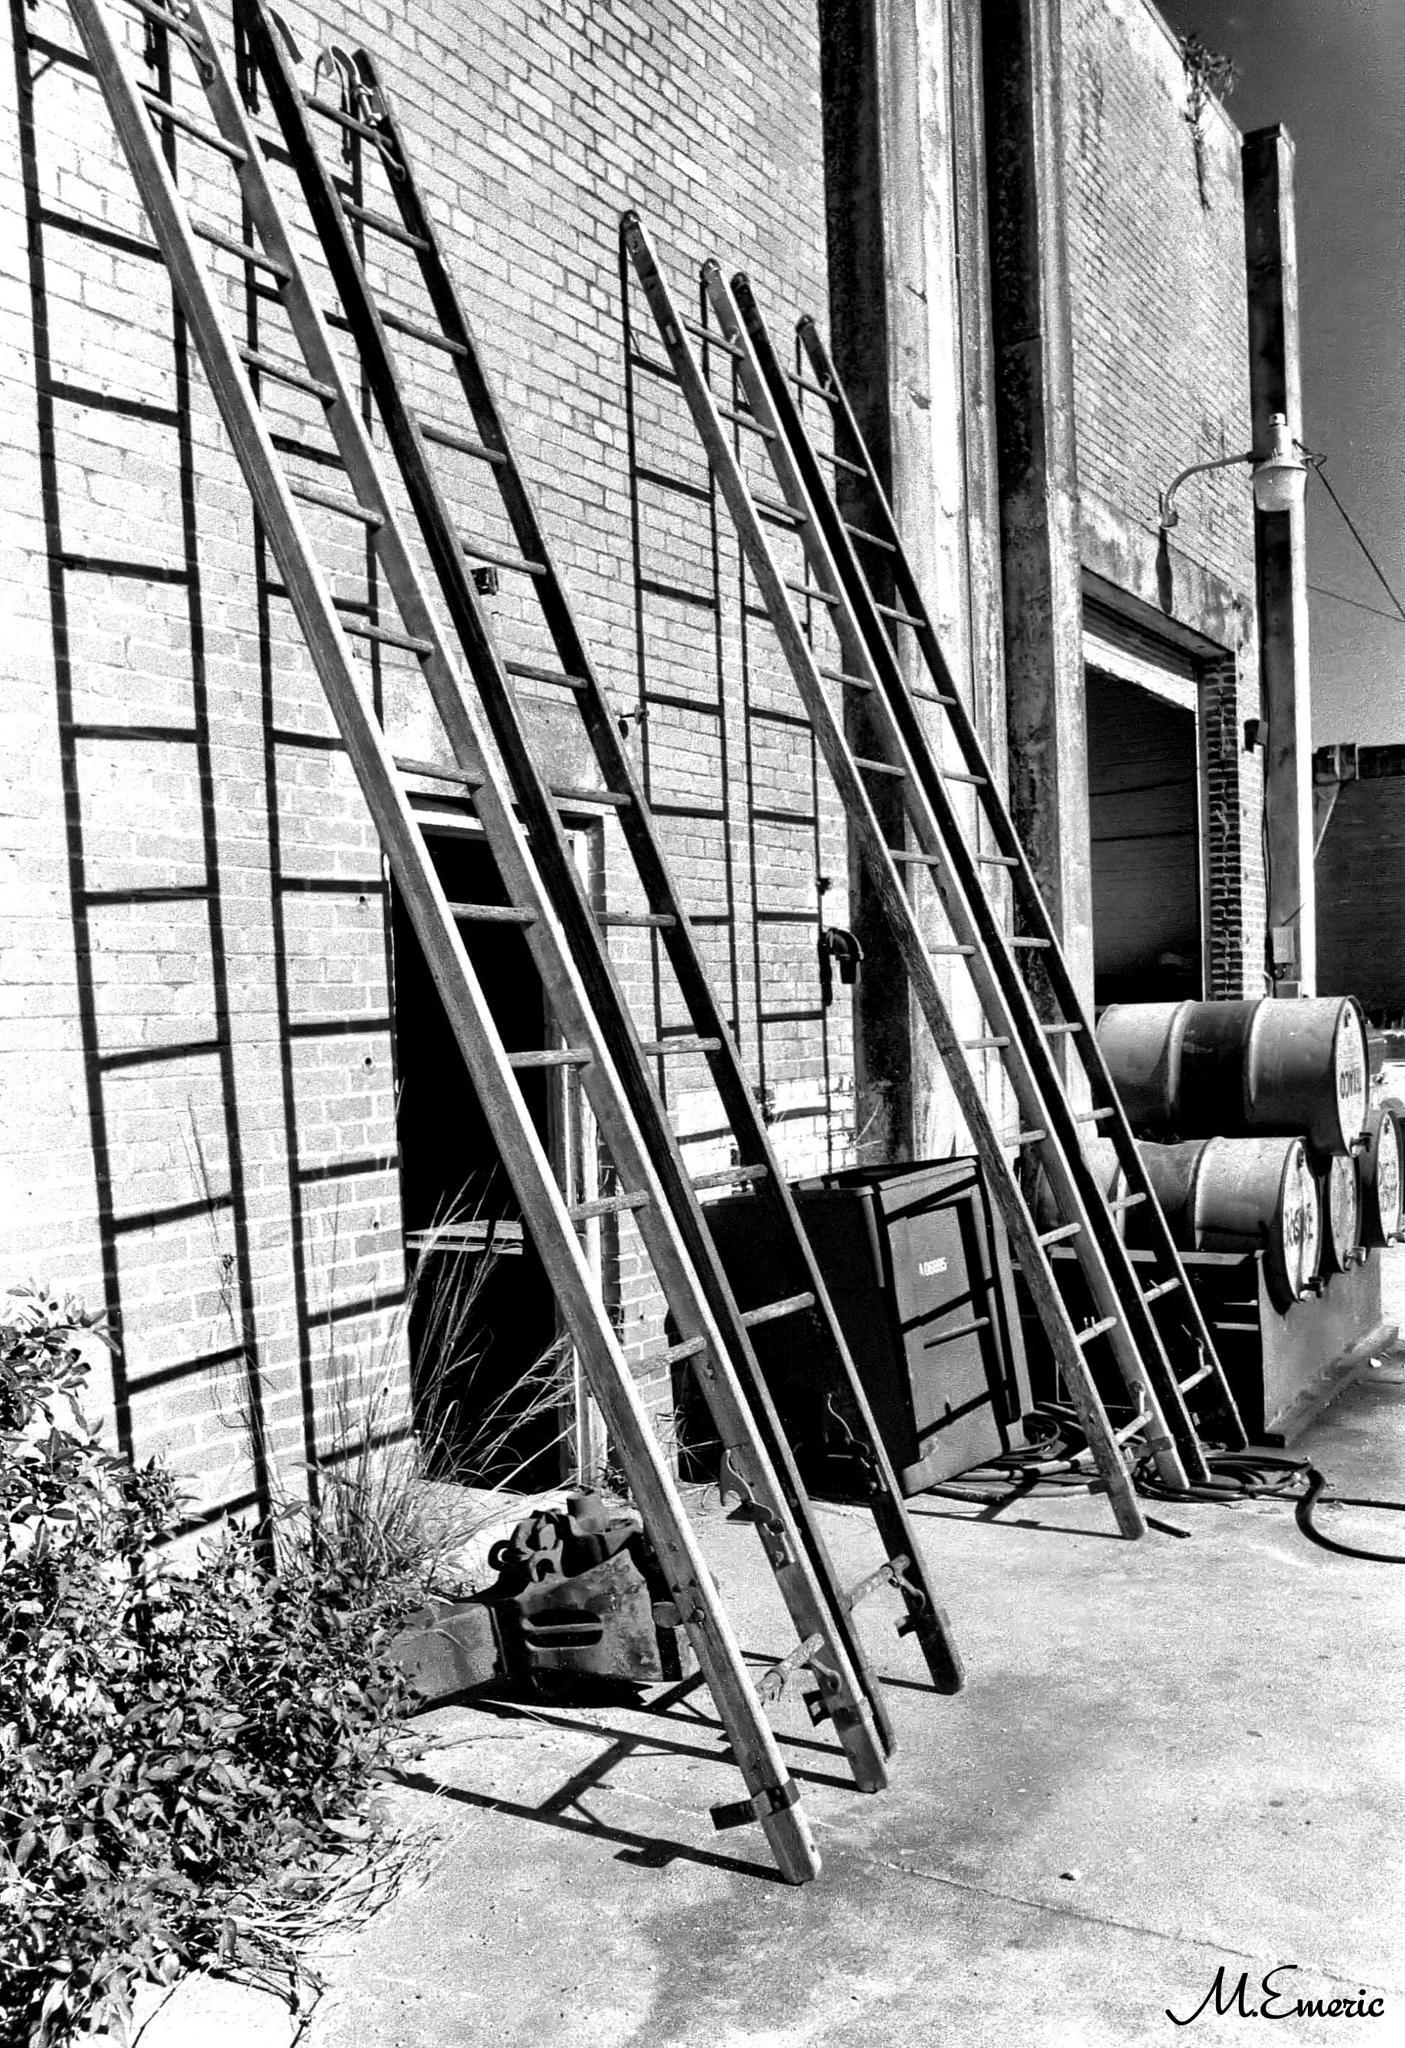 Bricks & Ladders by Maureen Emeric